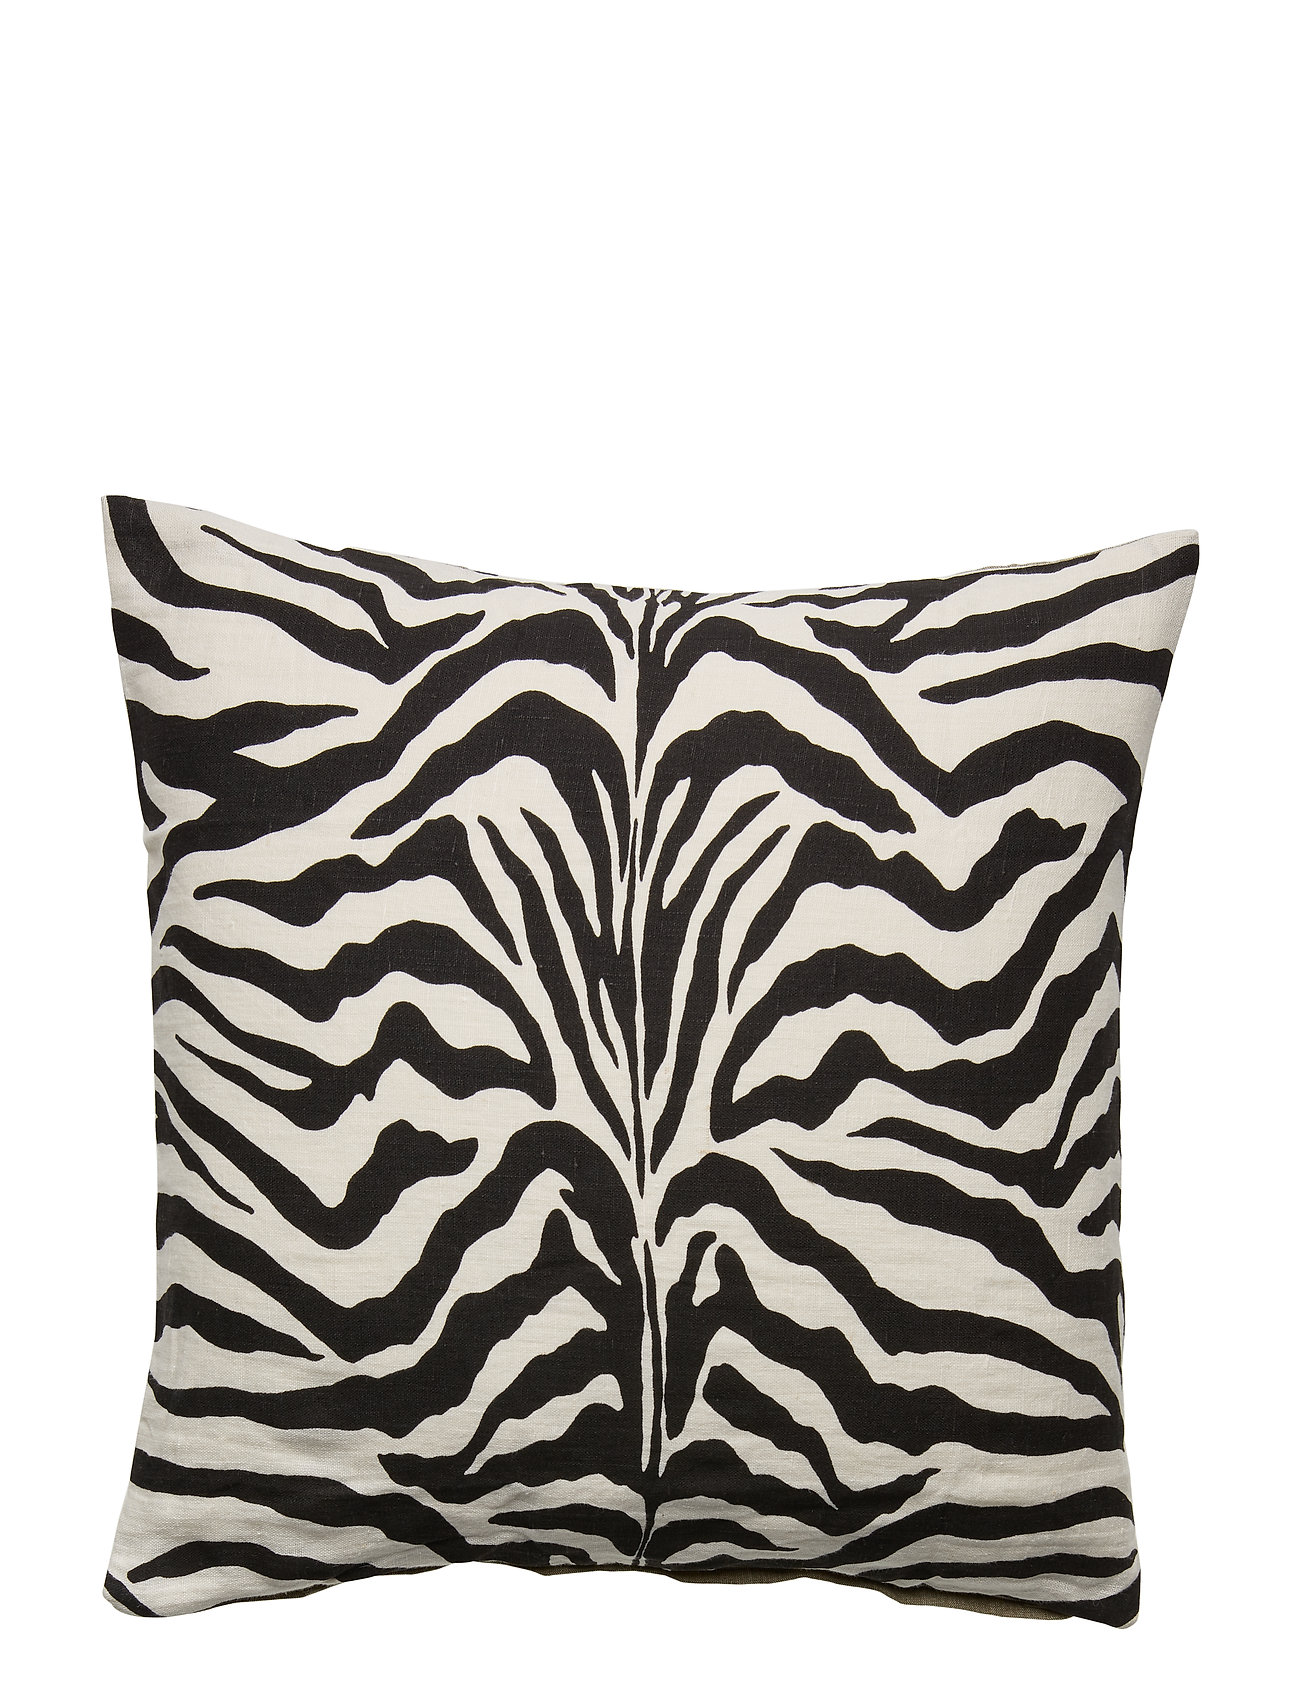 DAY Home Day Cushion Zebra Linen/Canvas - ZEBRA, PRINTED